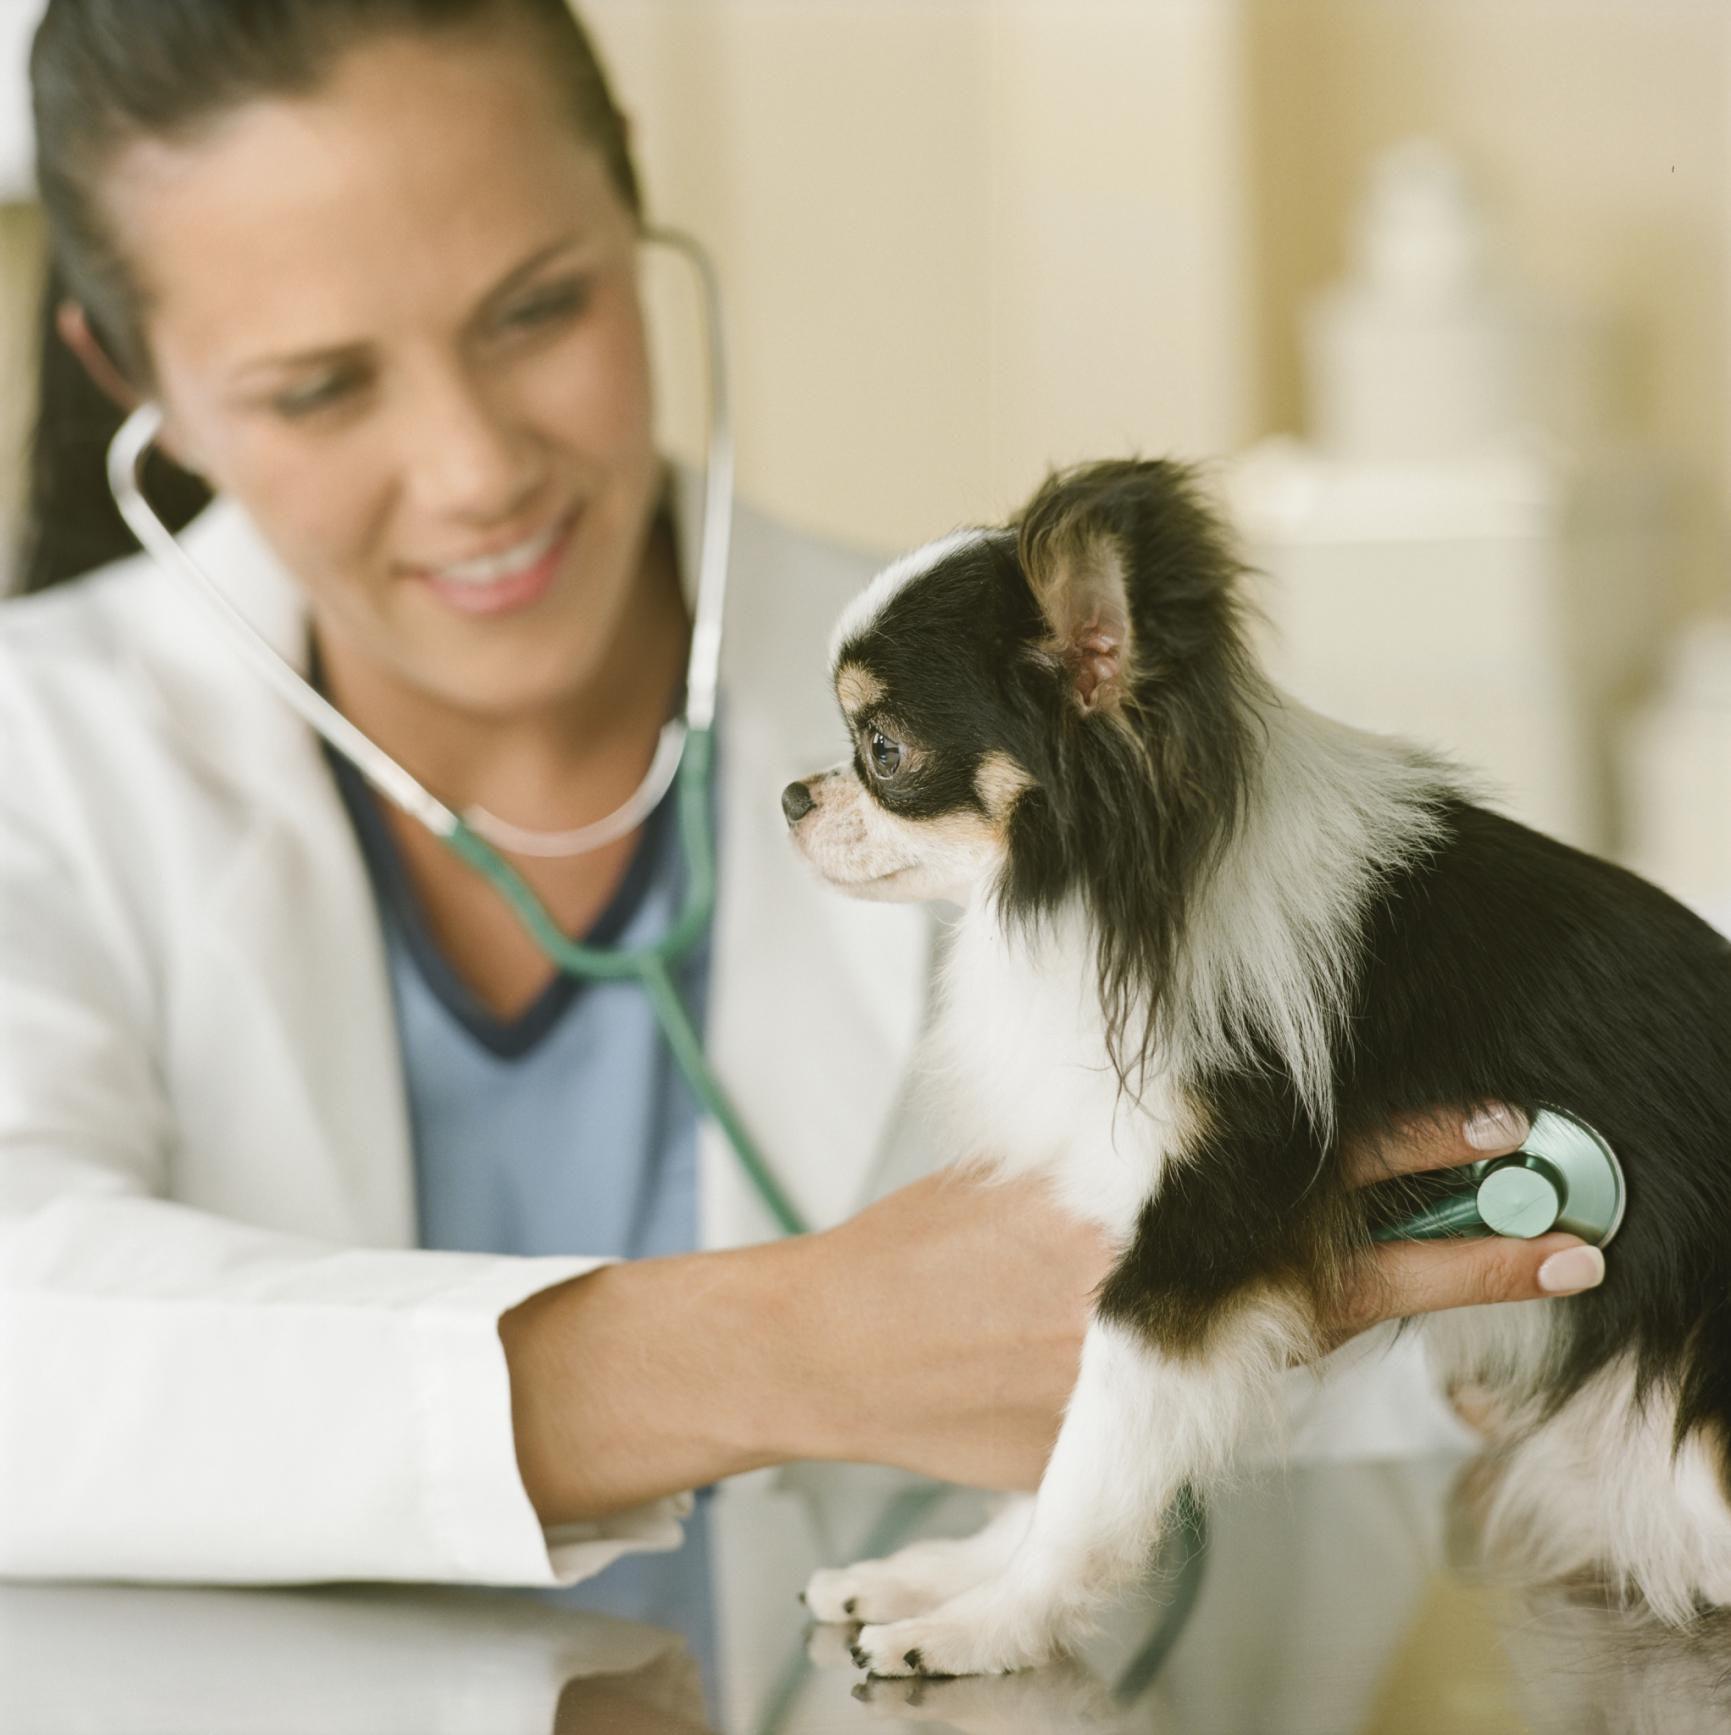 2017 06 search price list veterinary clinic - Relief Veterinarian Career Profile